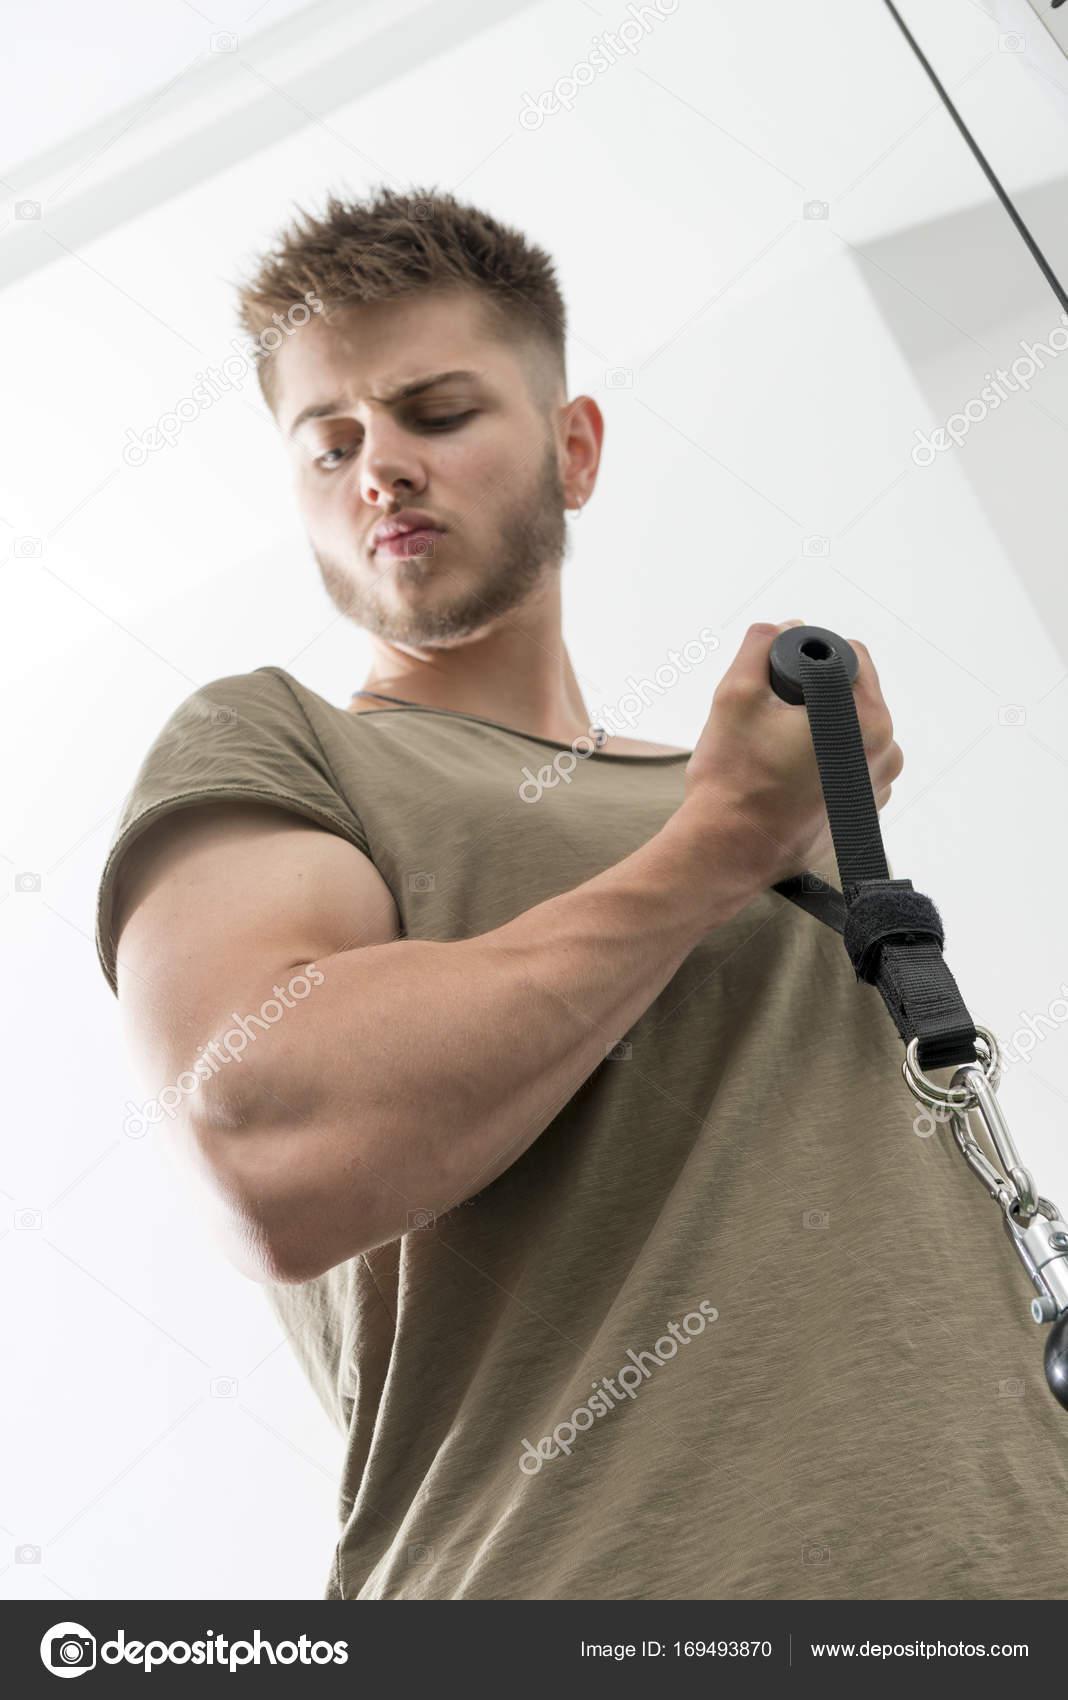 b2f854803353 Άντρας κοιτάζει επίμονα σε Bicep εκτελώντας μπούκλες με μηχανή με καλώδιο —  Εικόνα από stock photographyfirm.co.uk